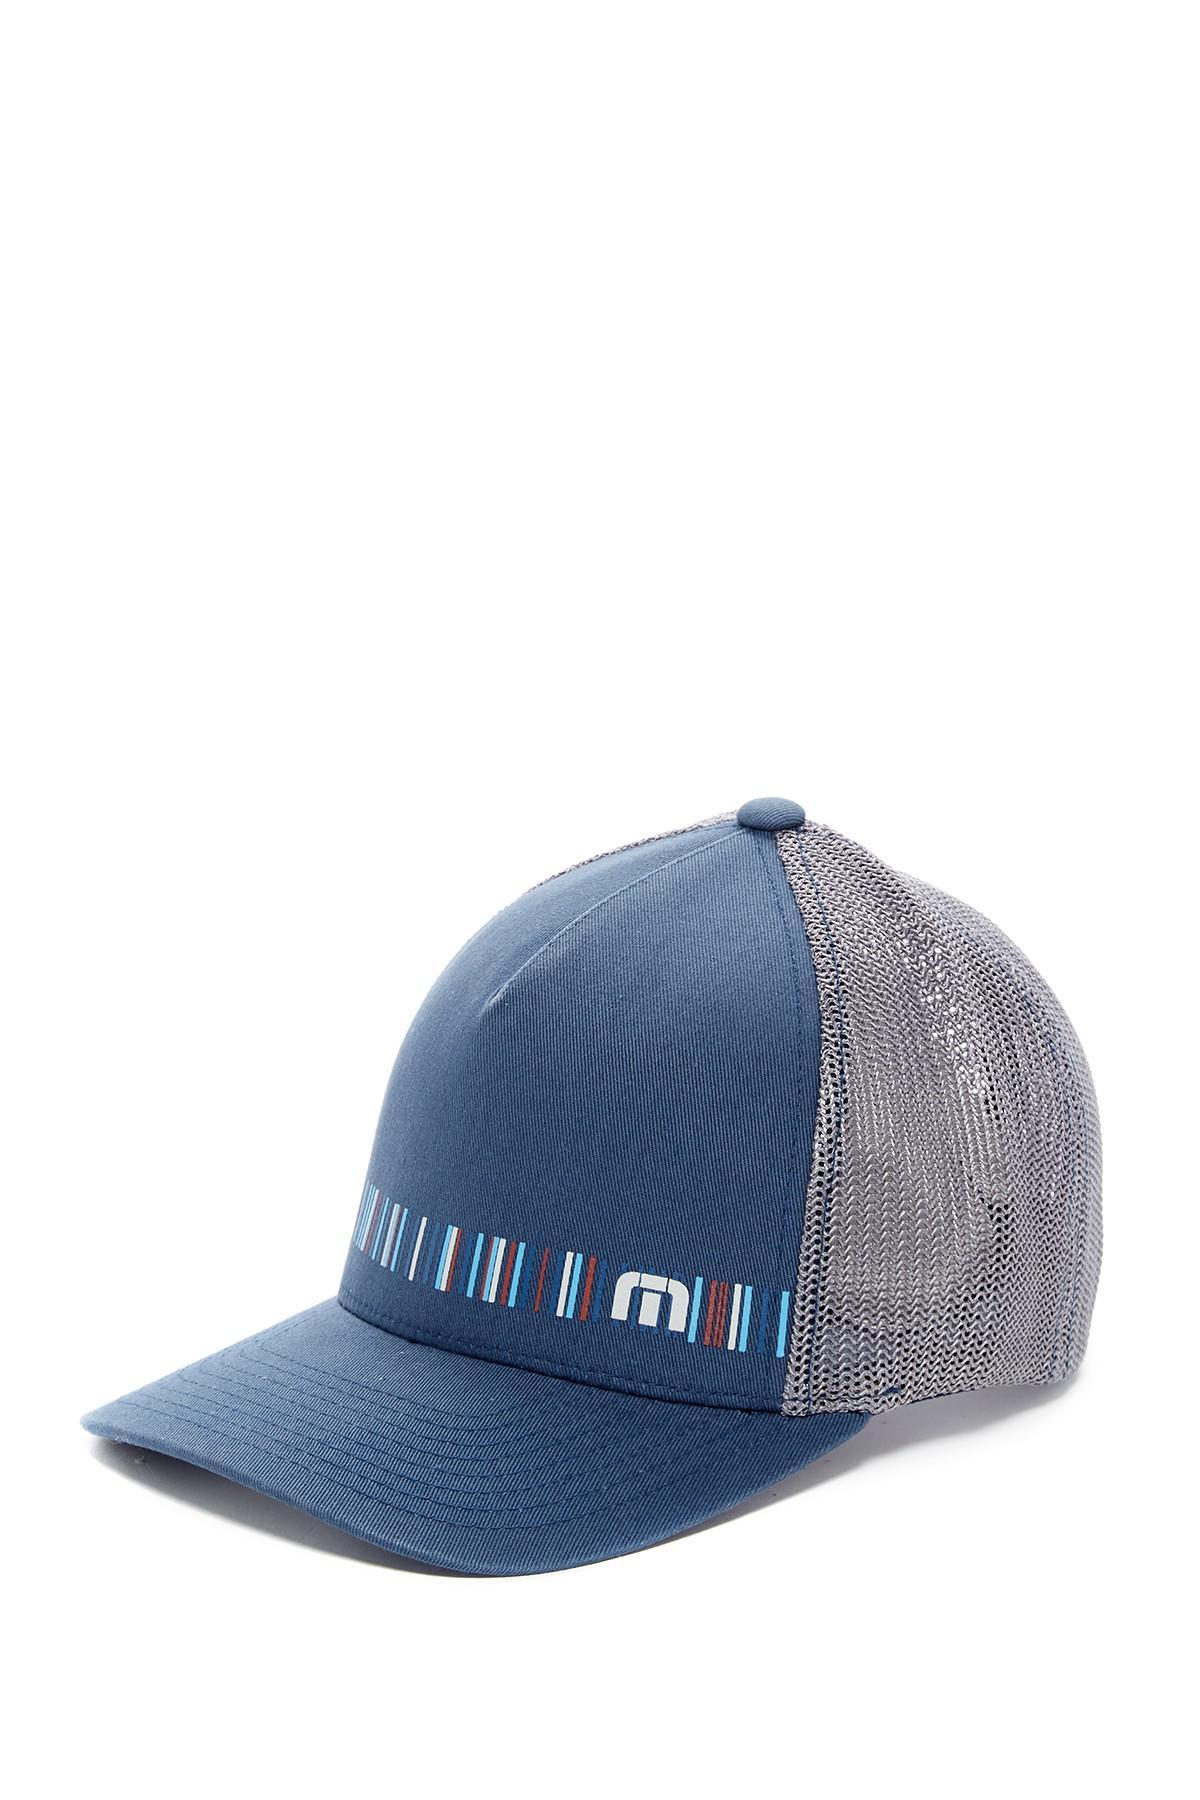 2727b9d1d9d Lyst - Travis Mathew Peck Hat in Blue for Men